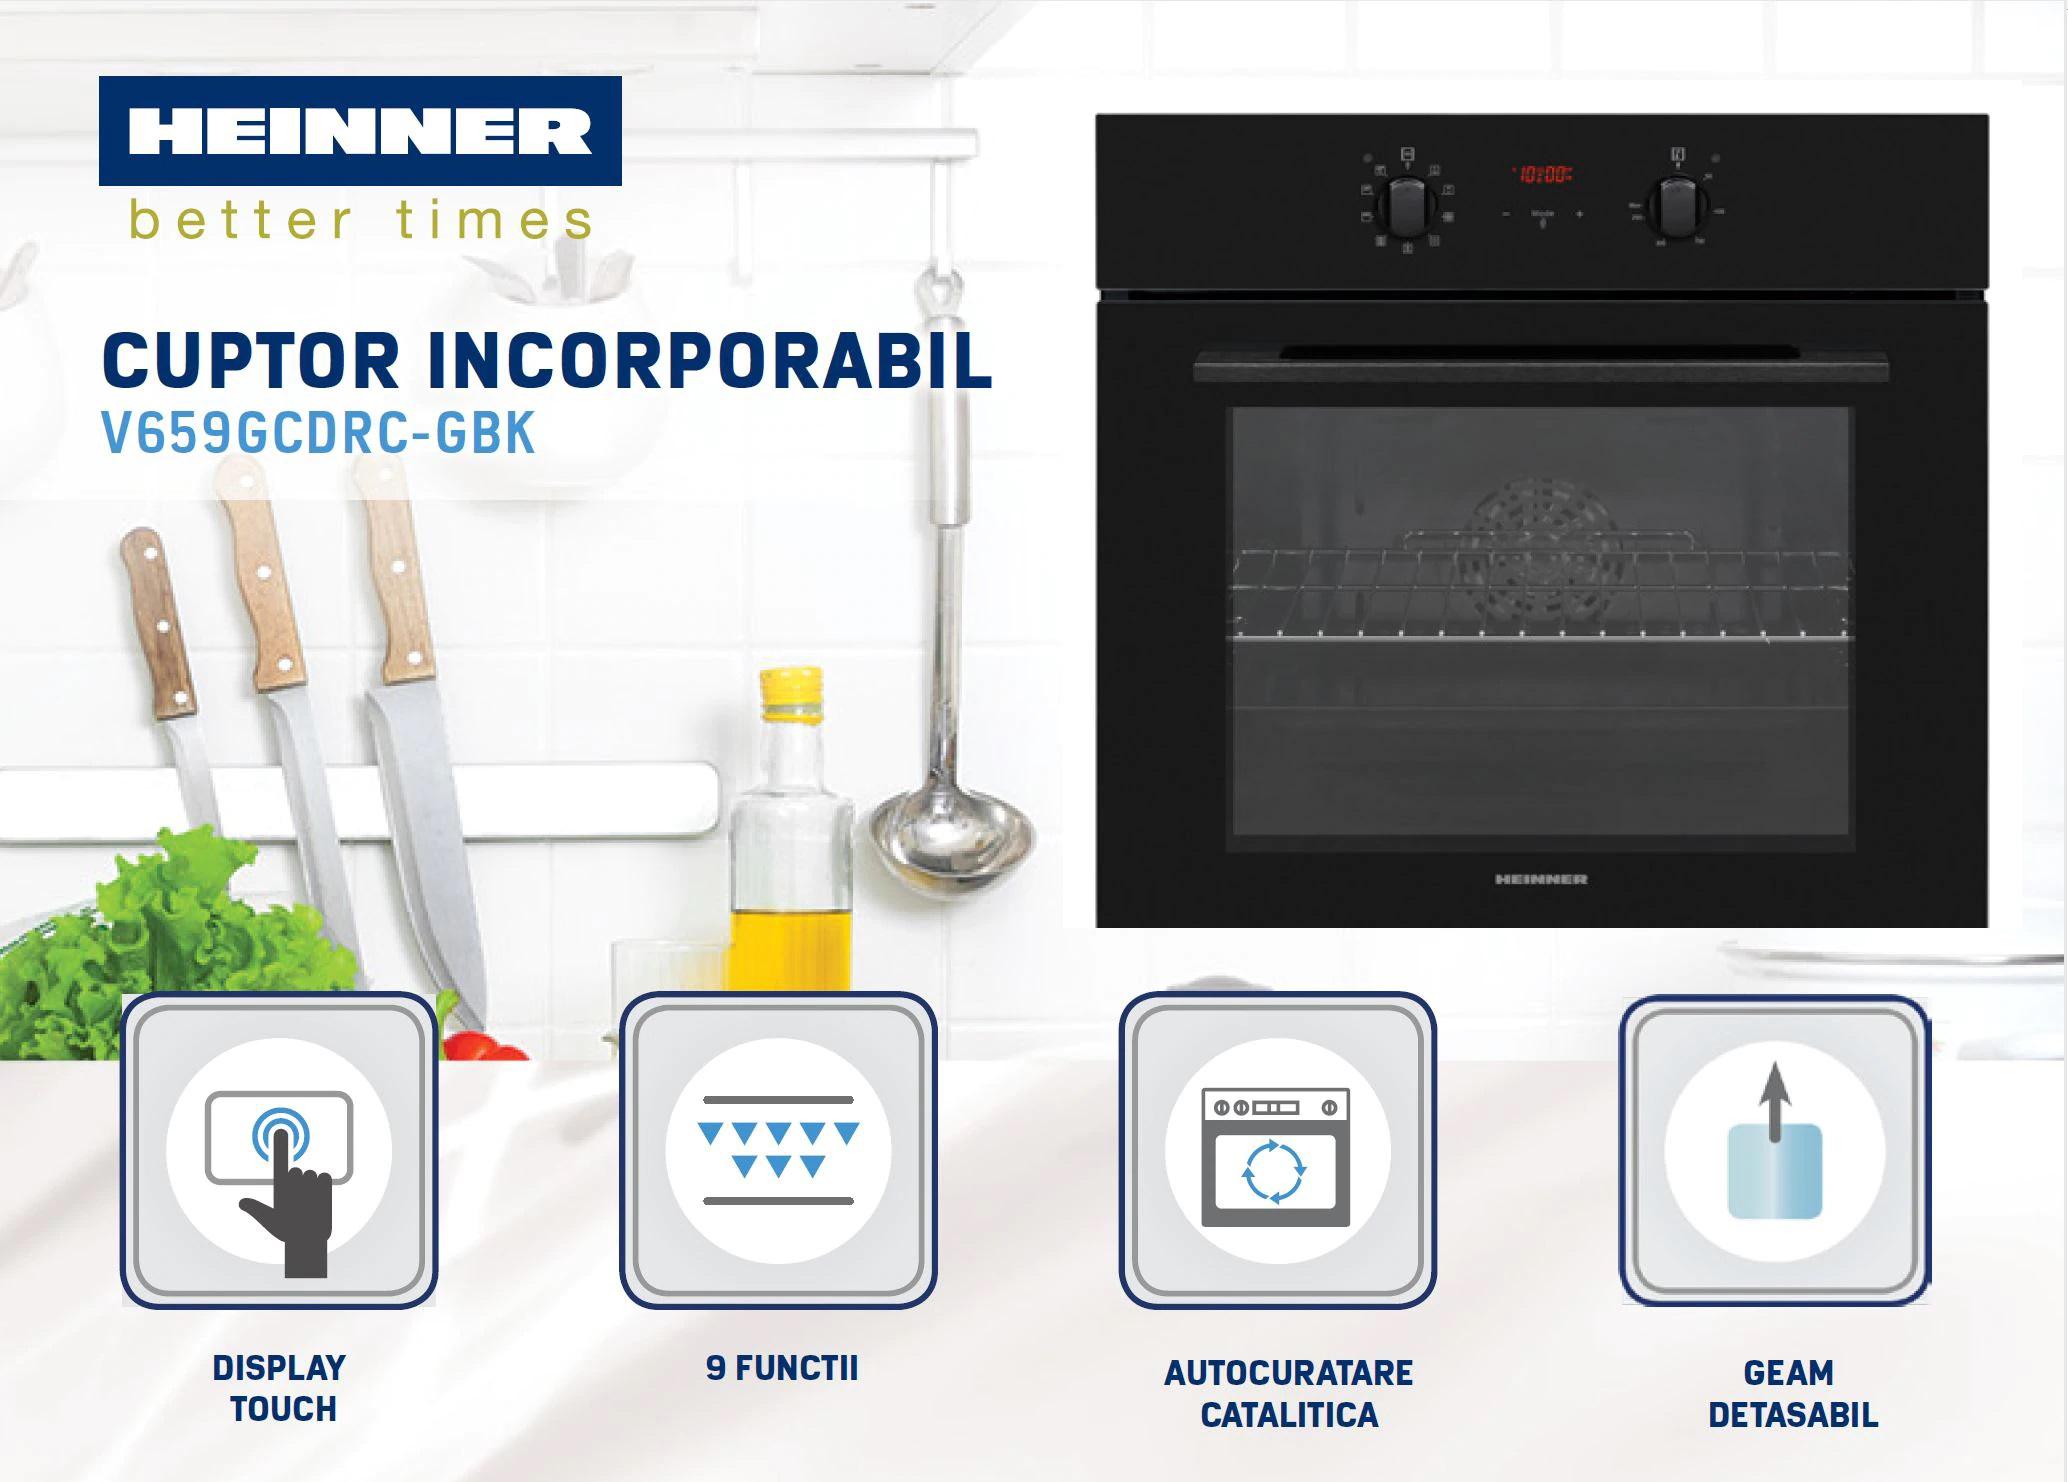 descriere cuptor incorporabil Heinner HBO-V659GCDRC-GBK